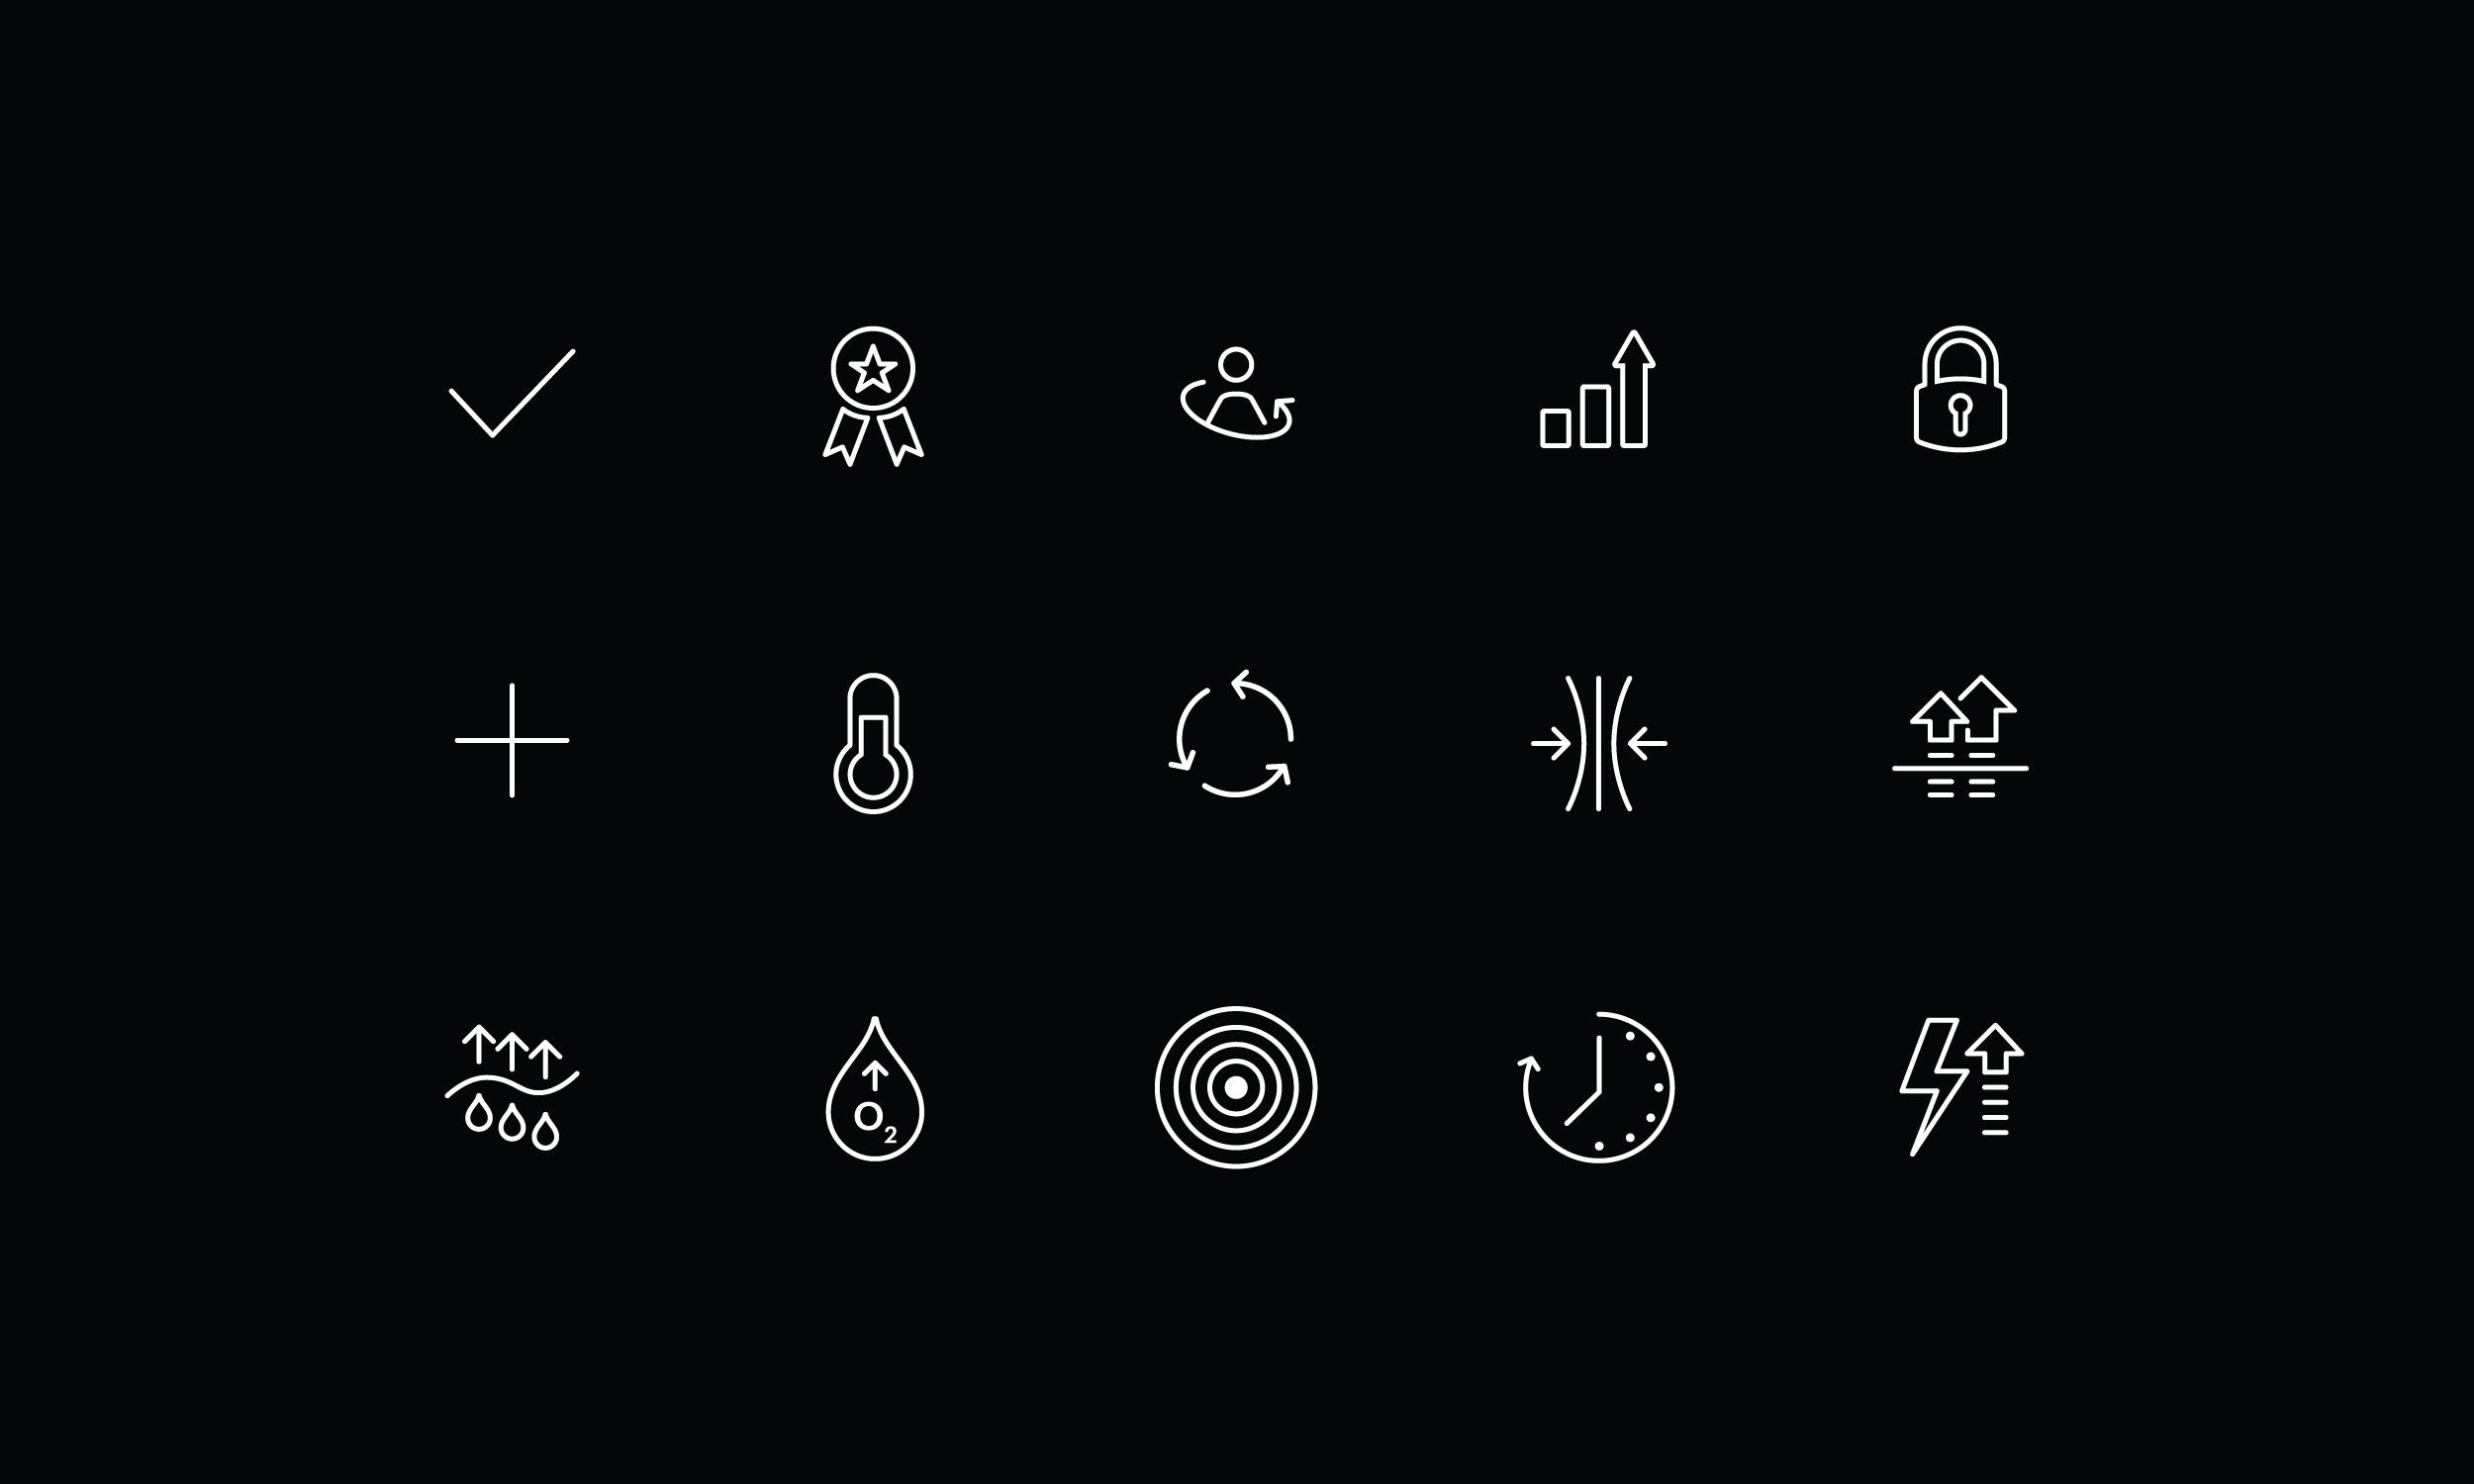 Icons-2.jpg